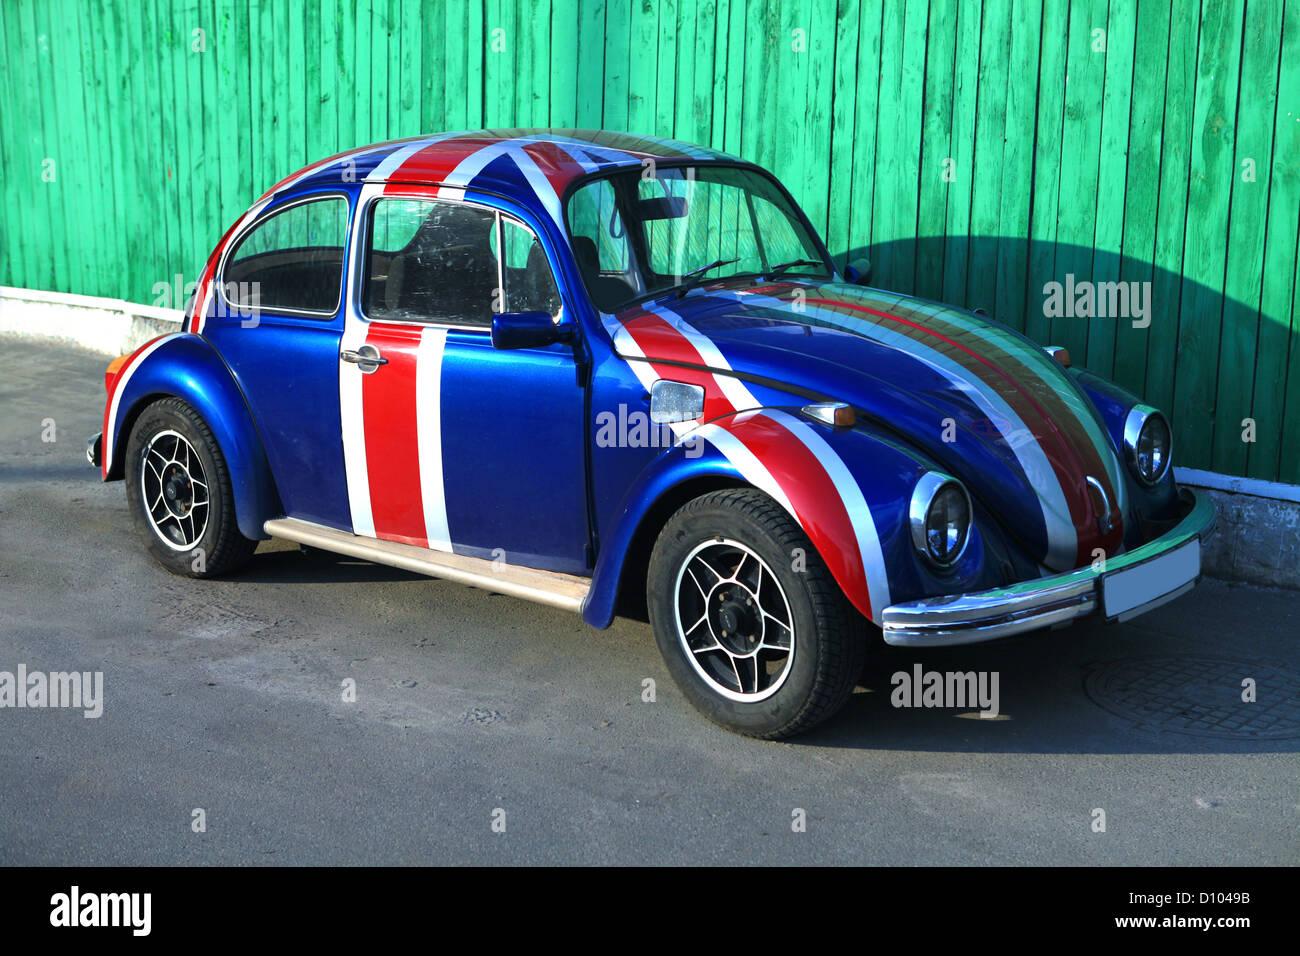 dark blue old vintage beetle car park street - Stock Image